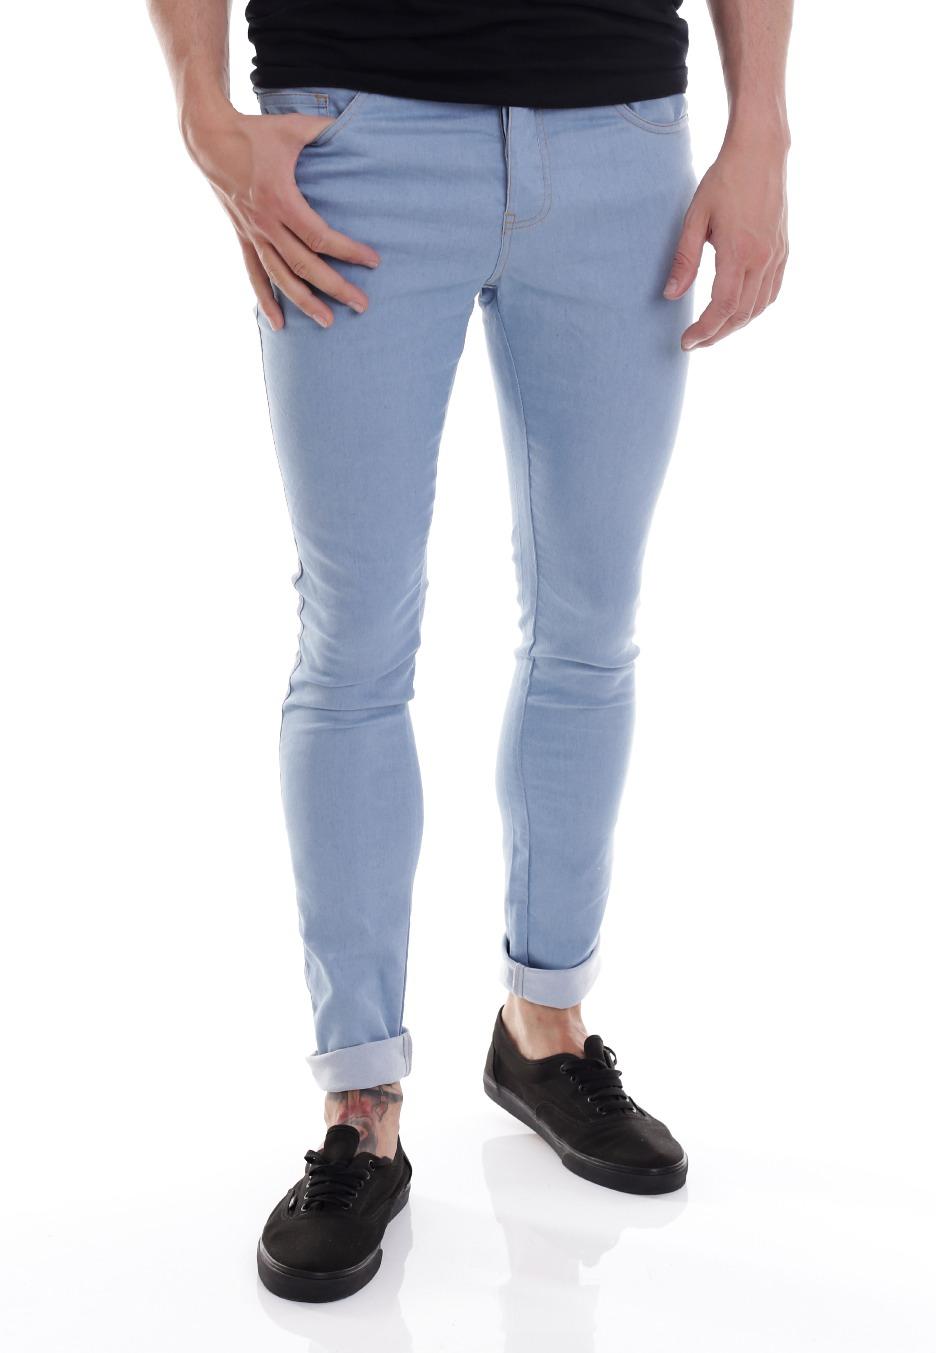 Ironnail  Perrin Skinny Light Blue  Jeans  Streetwear